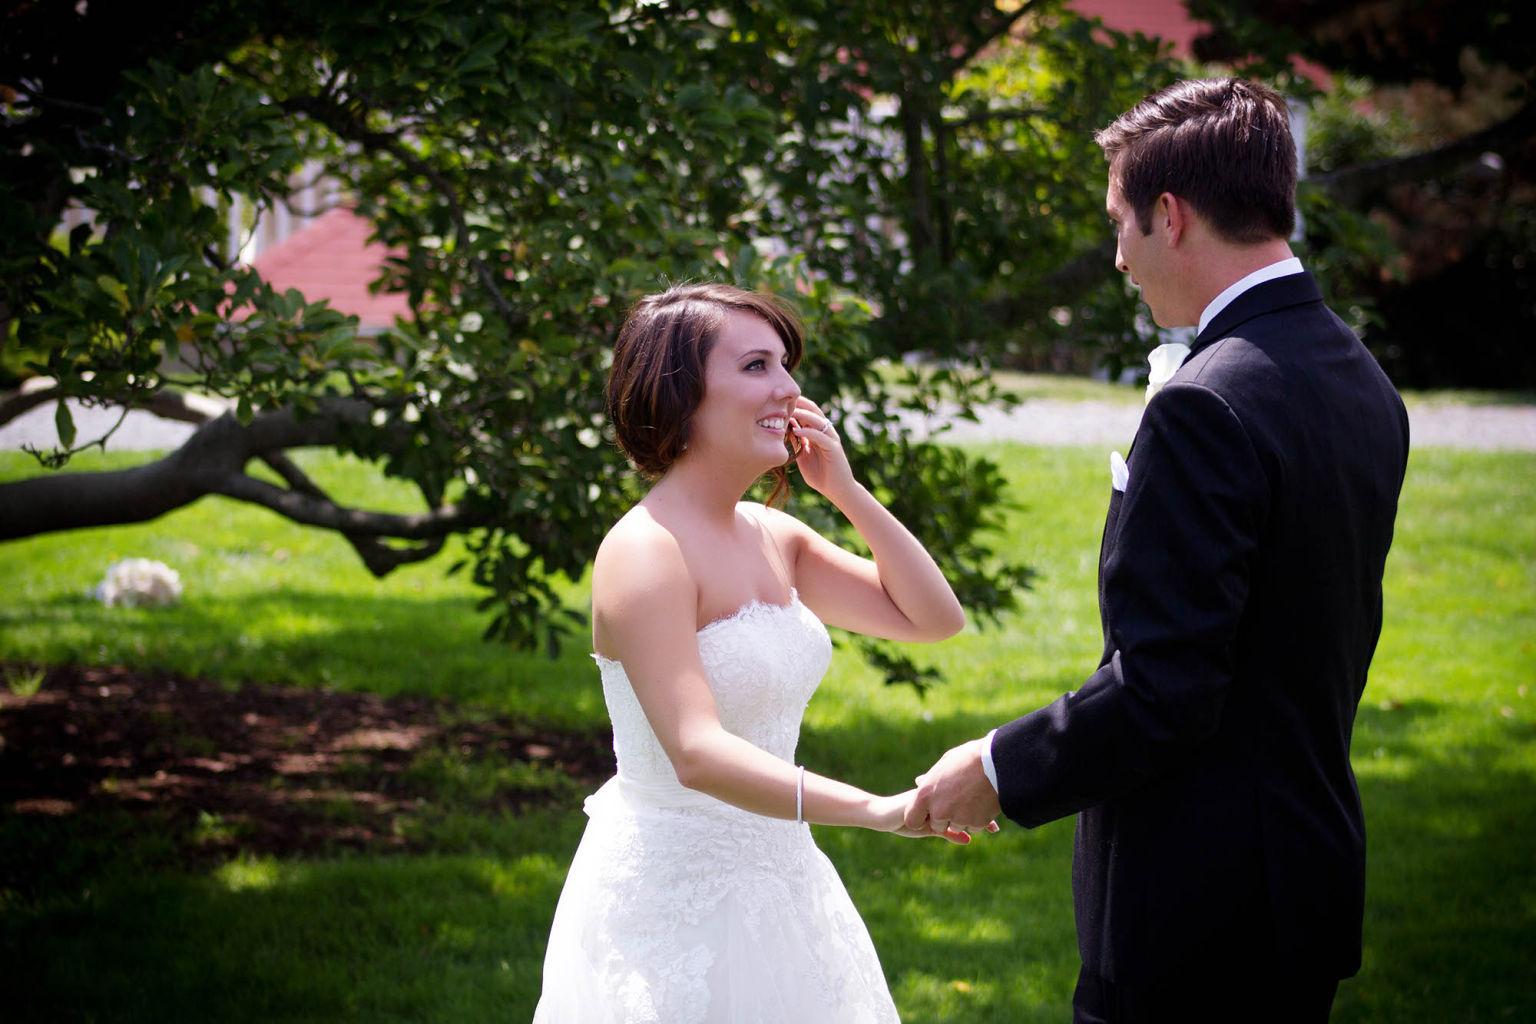 Wentworth-weddings-124LaurenMike-1155 A